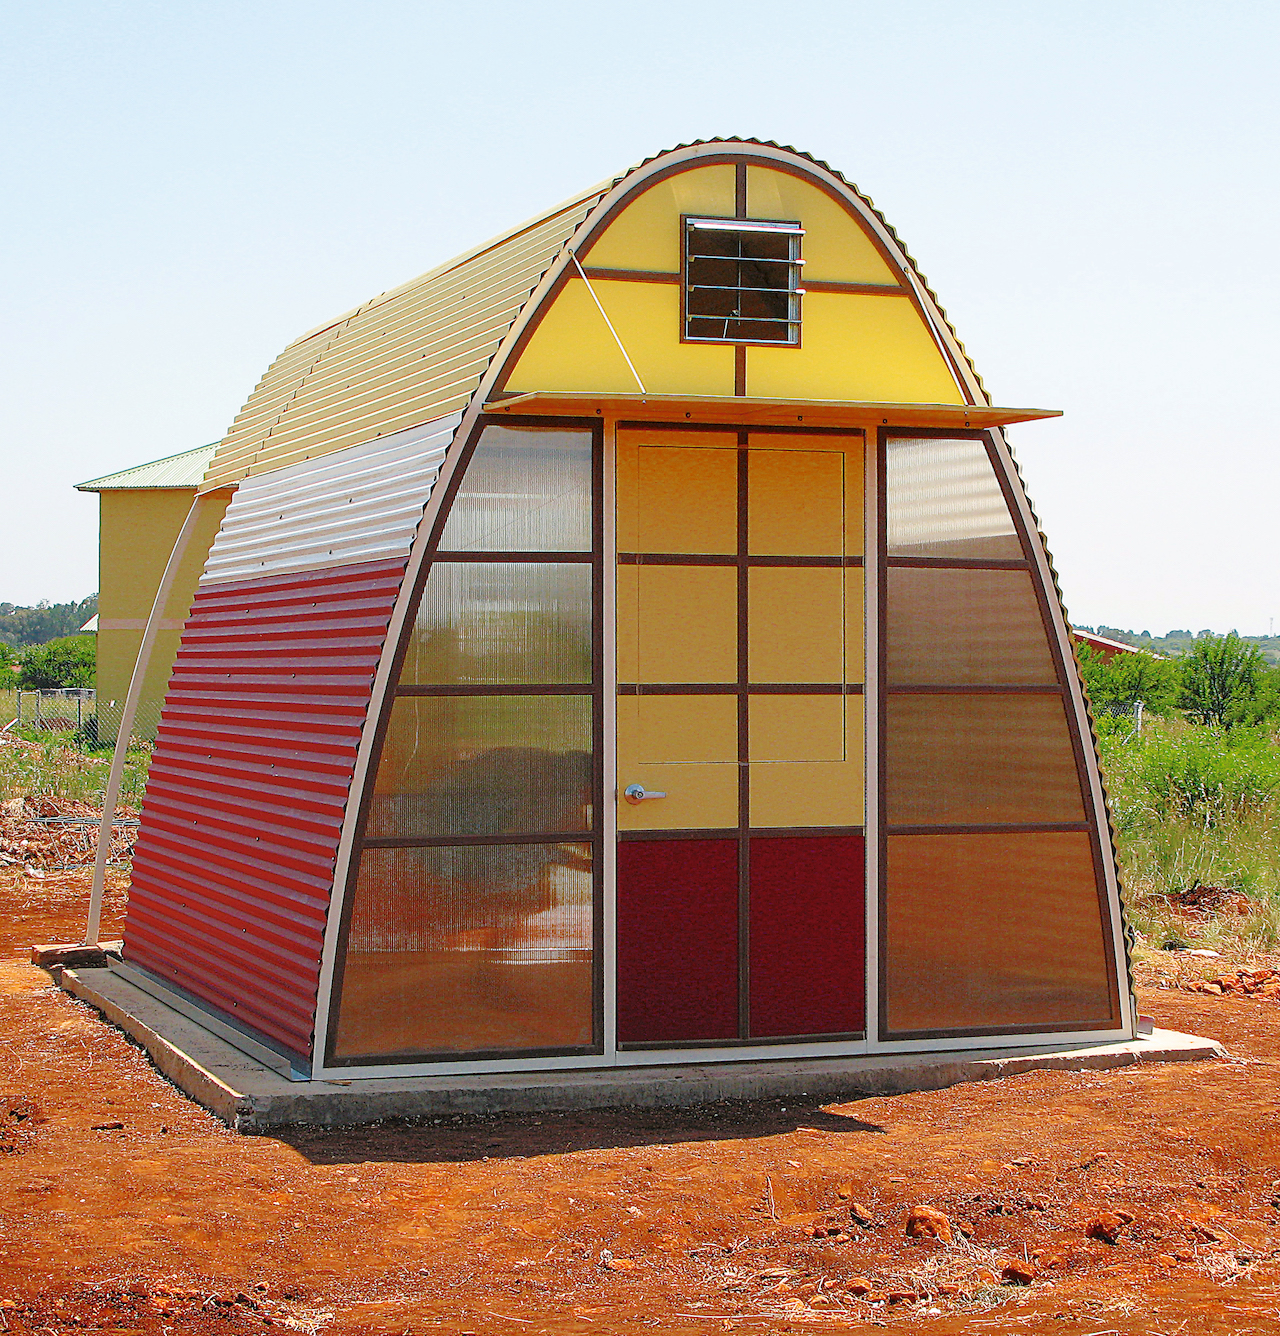 085 Abod Shelter